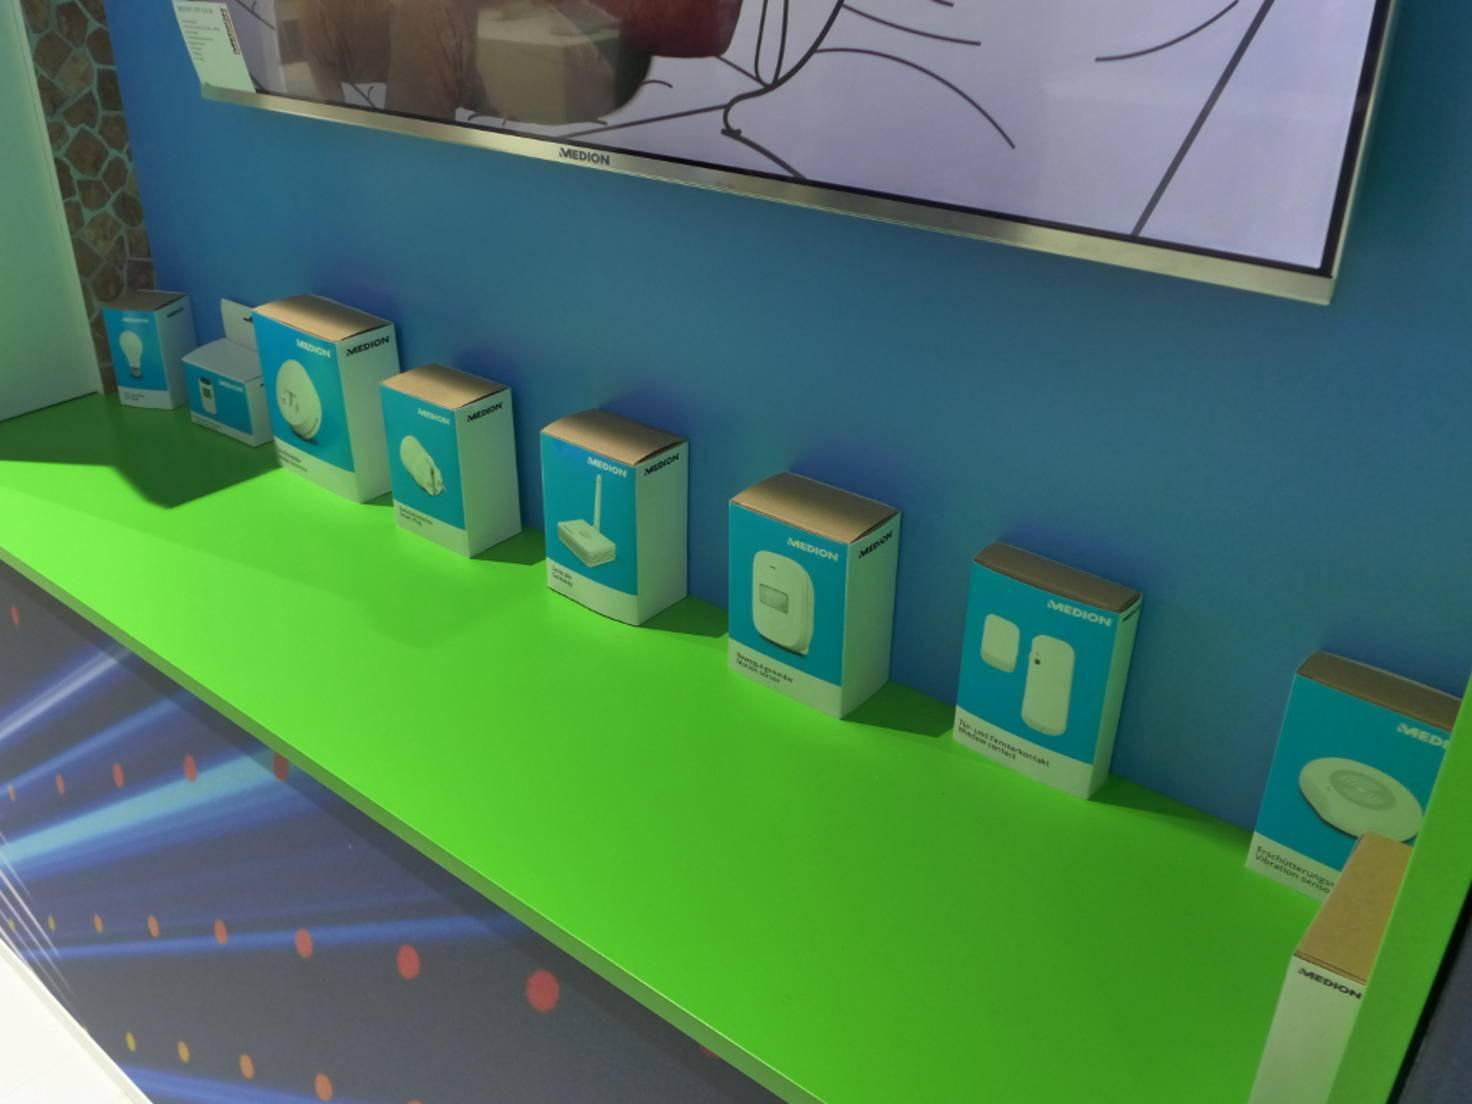 Medion Smart Home IFA 2016